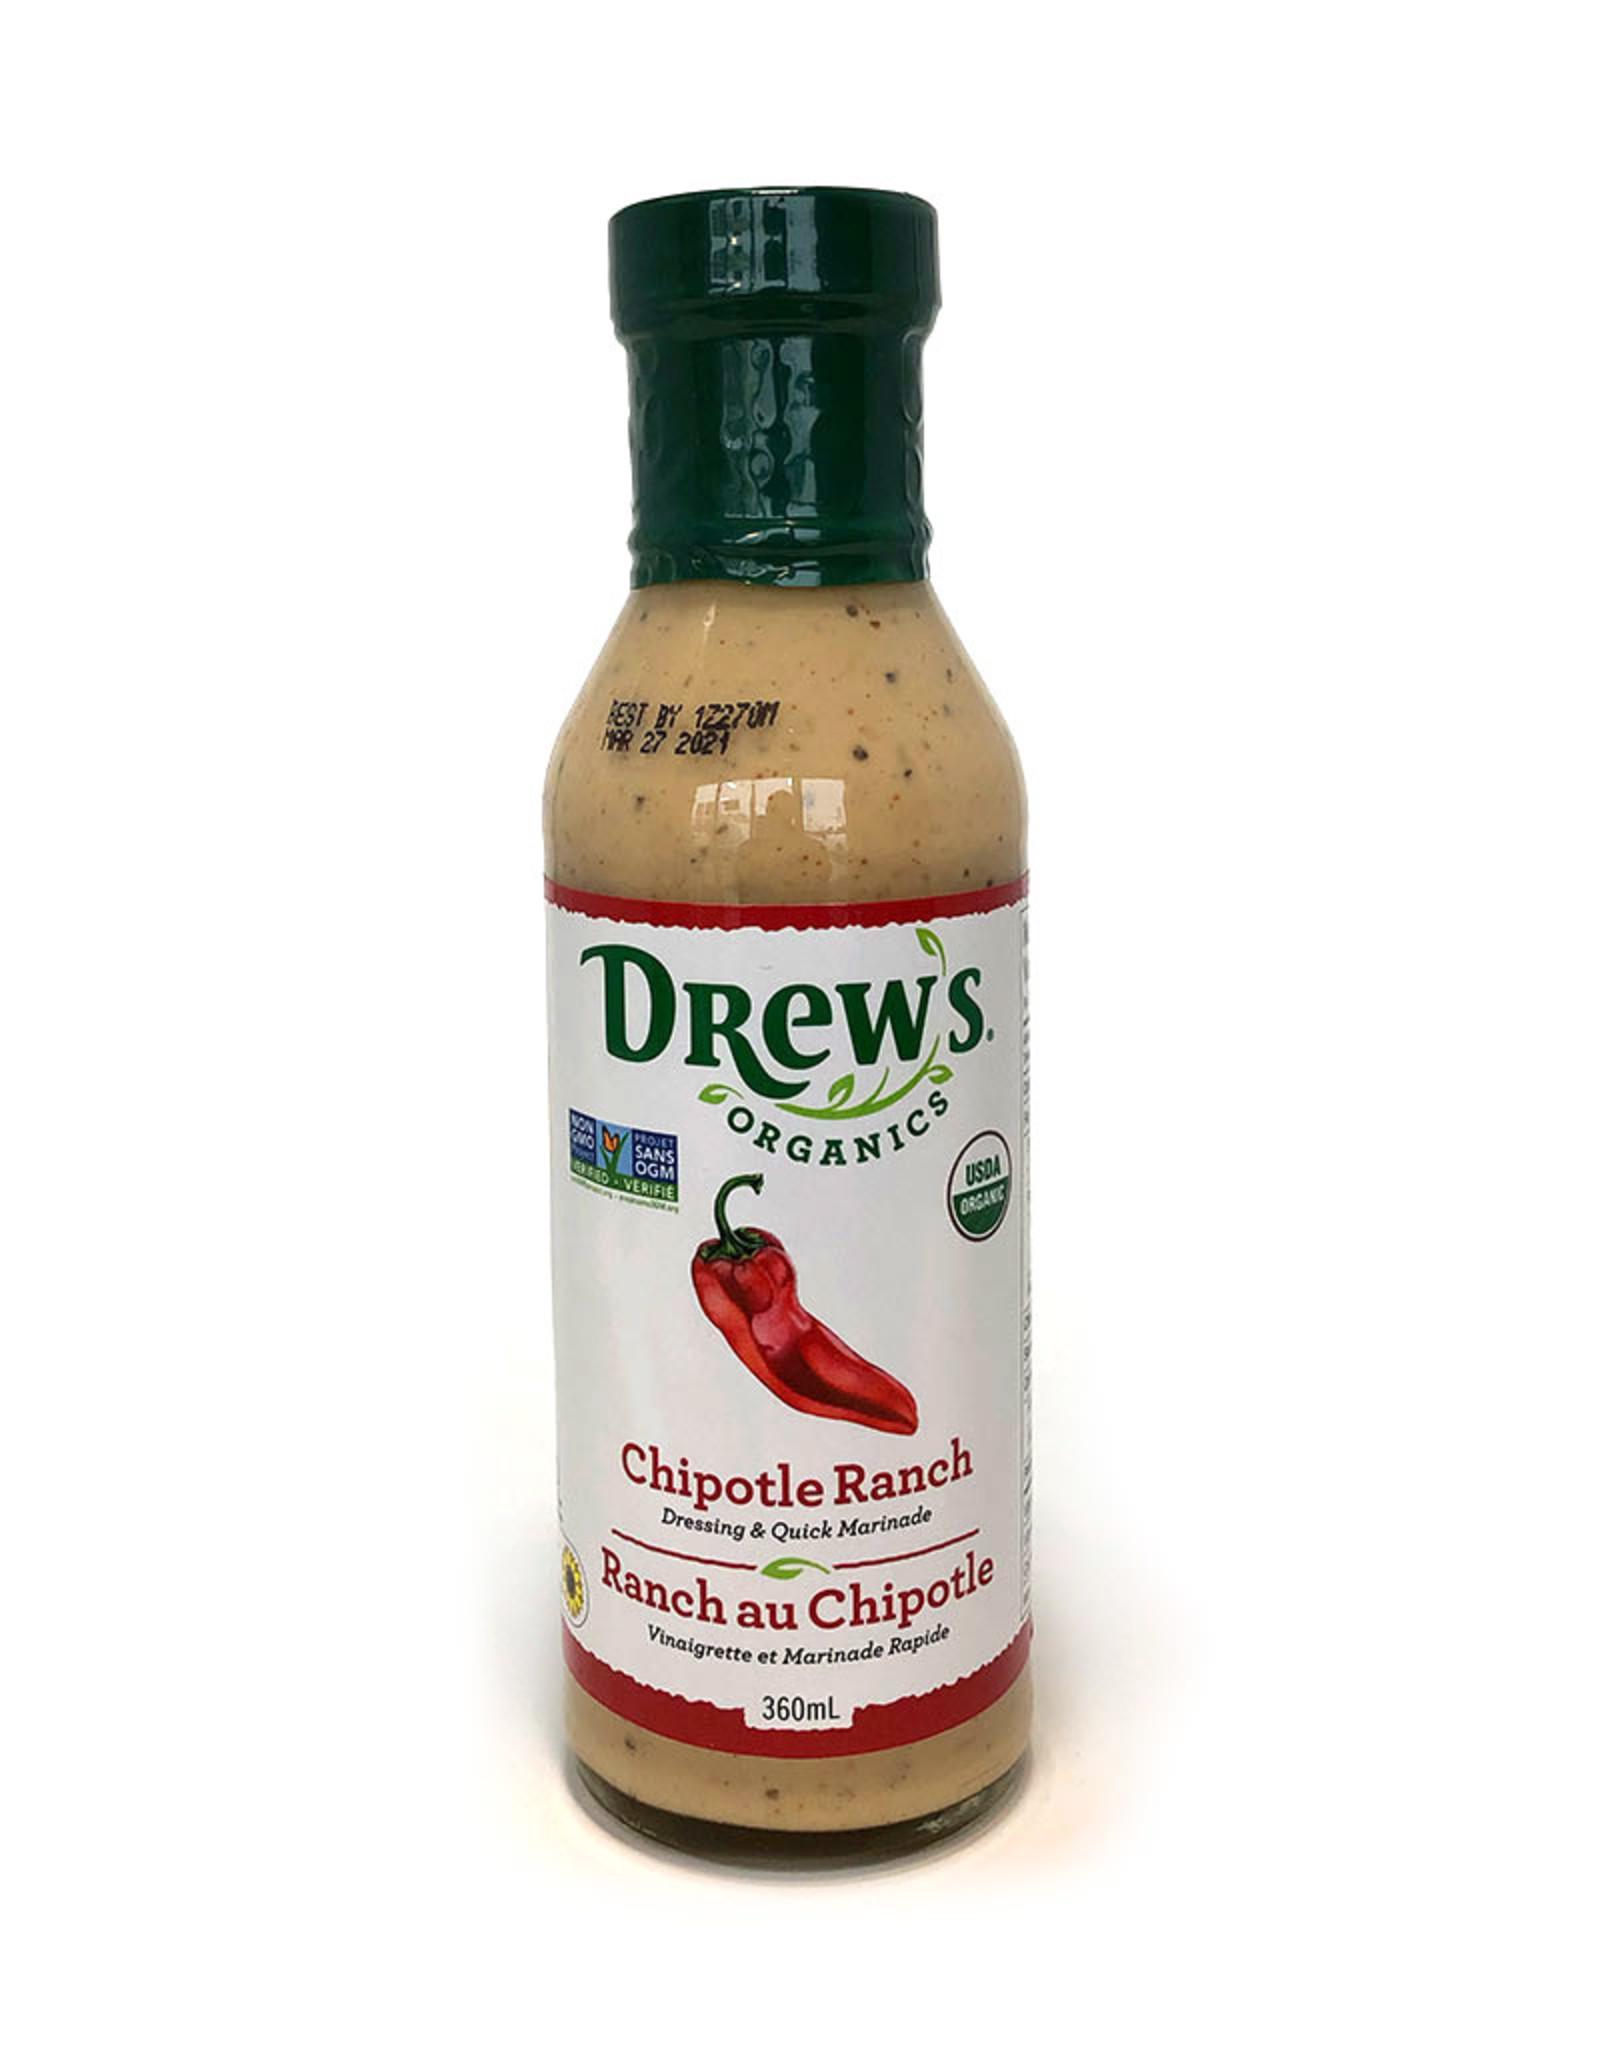 Drews Organics Drews - Organic Dressing, Chipotle Ranch (360ml)